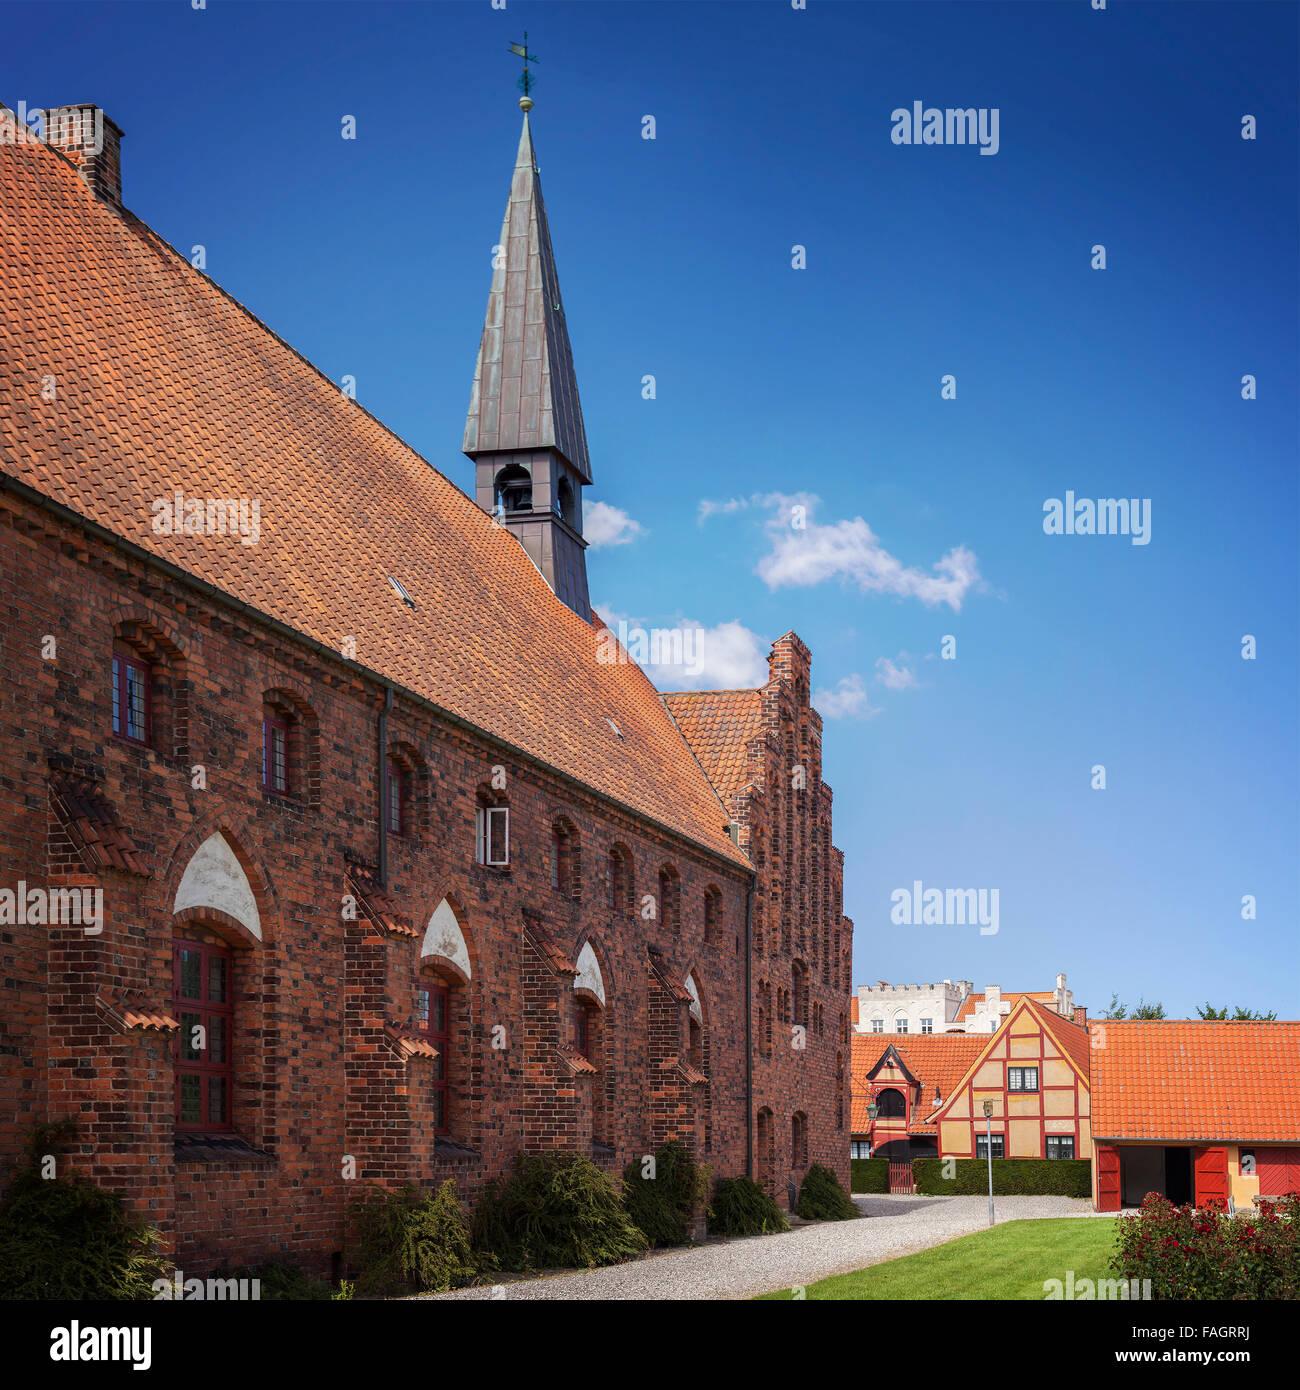 Image of the longhouse of Saint Olafs church. Helsingor, Denmark. - Stock Image